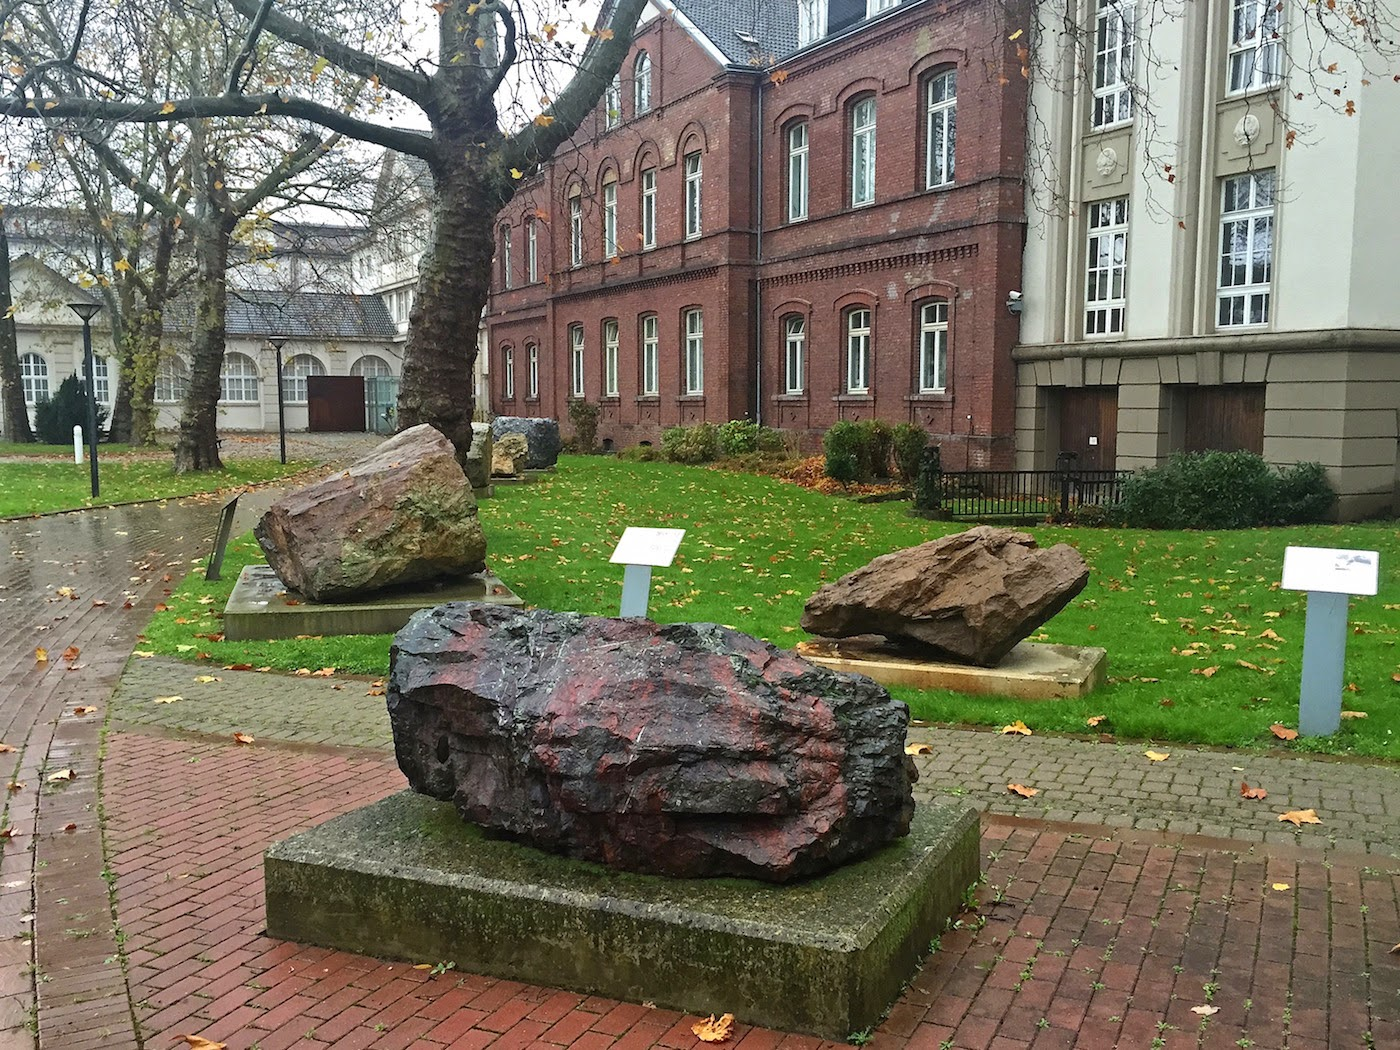 Lehrpfad im Park vor dem Museum Hoesch